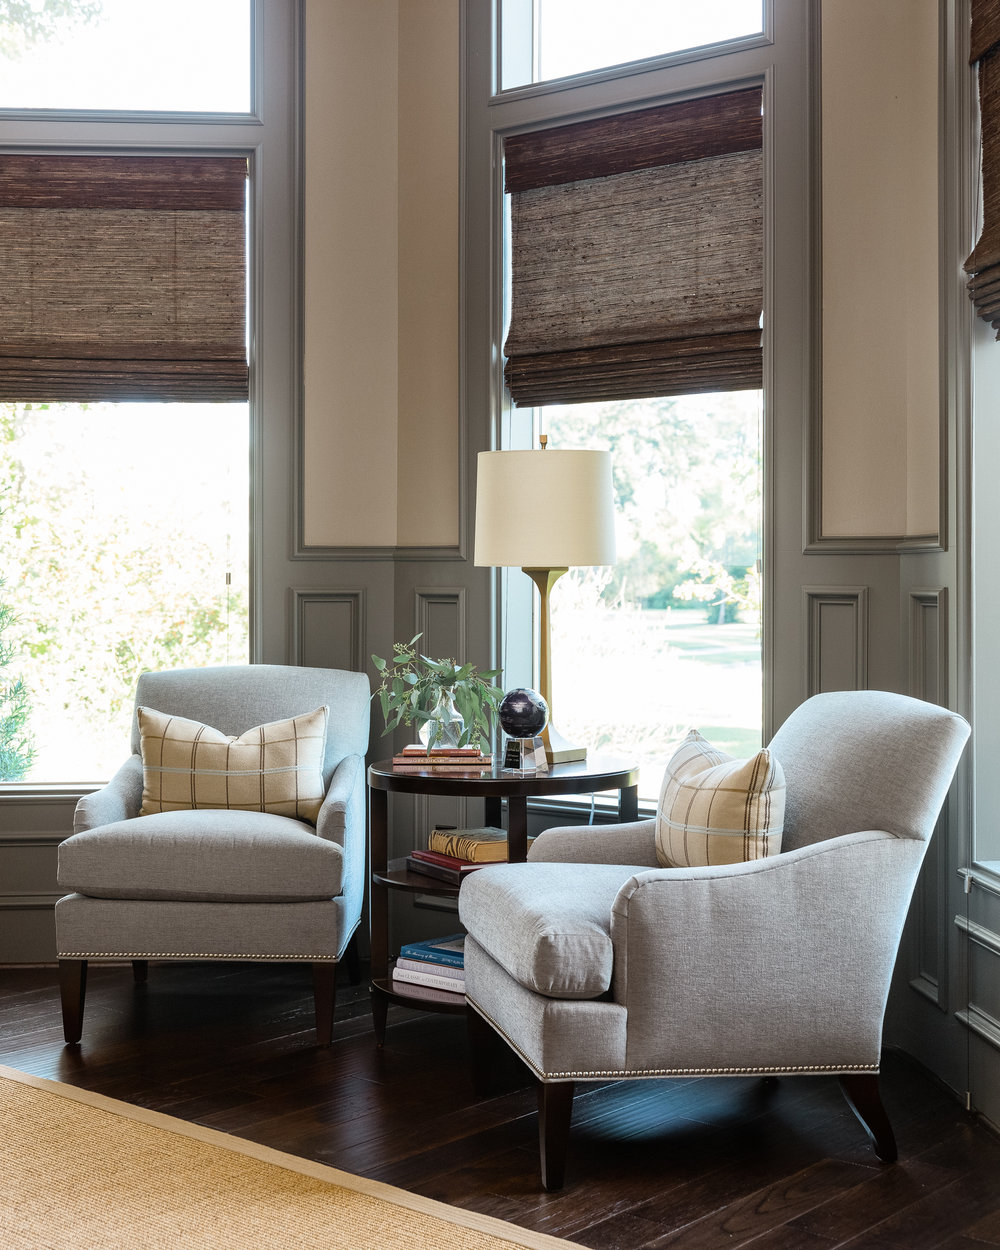 Home Office Seating | Carla Aston - Designer, Shaun Bain - Contractor, Colleen Scott - Photographer #study #homeoffice #paneling